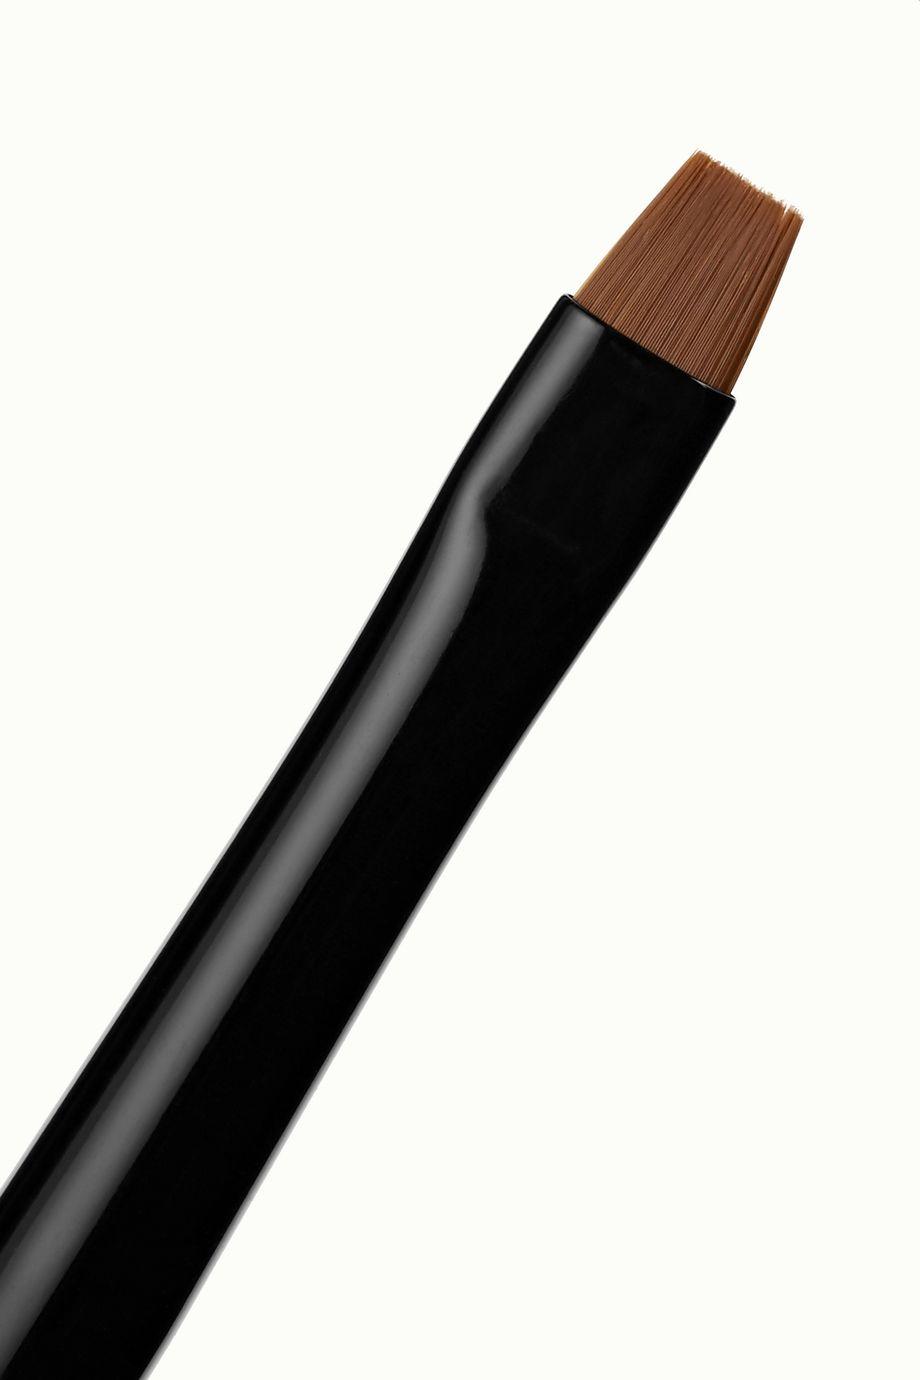 Rae Morris Jishaku 17 Square Lash Liner Brush